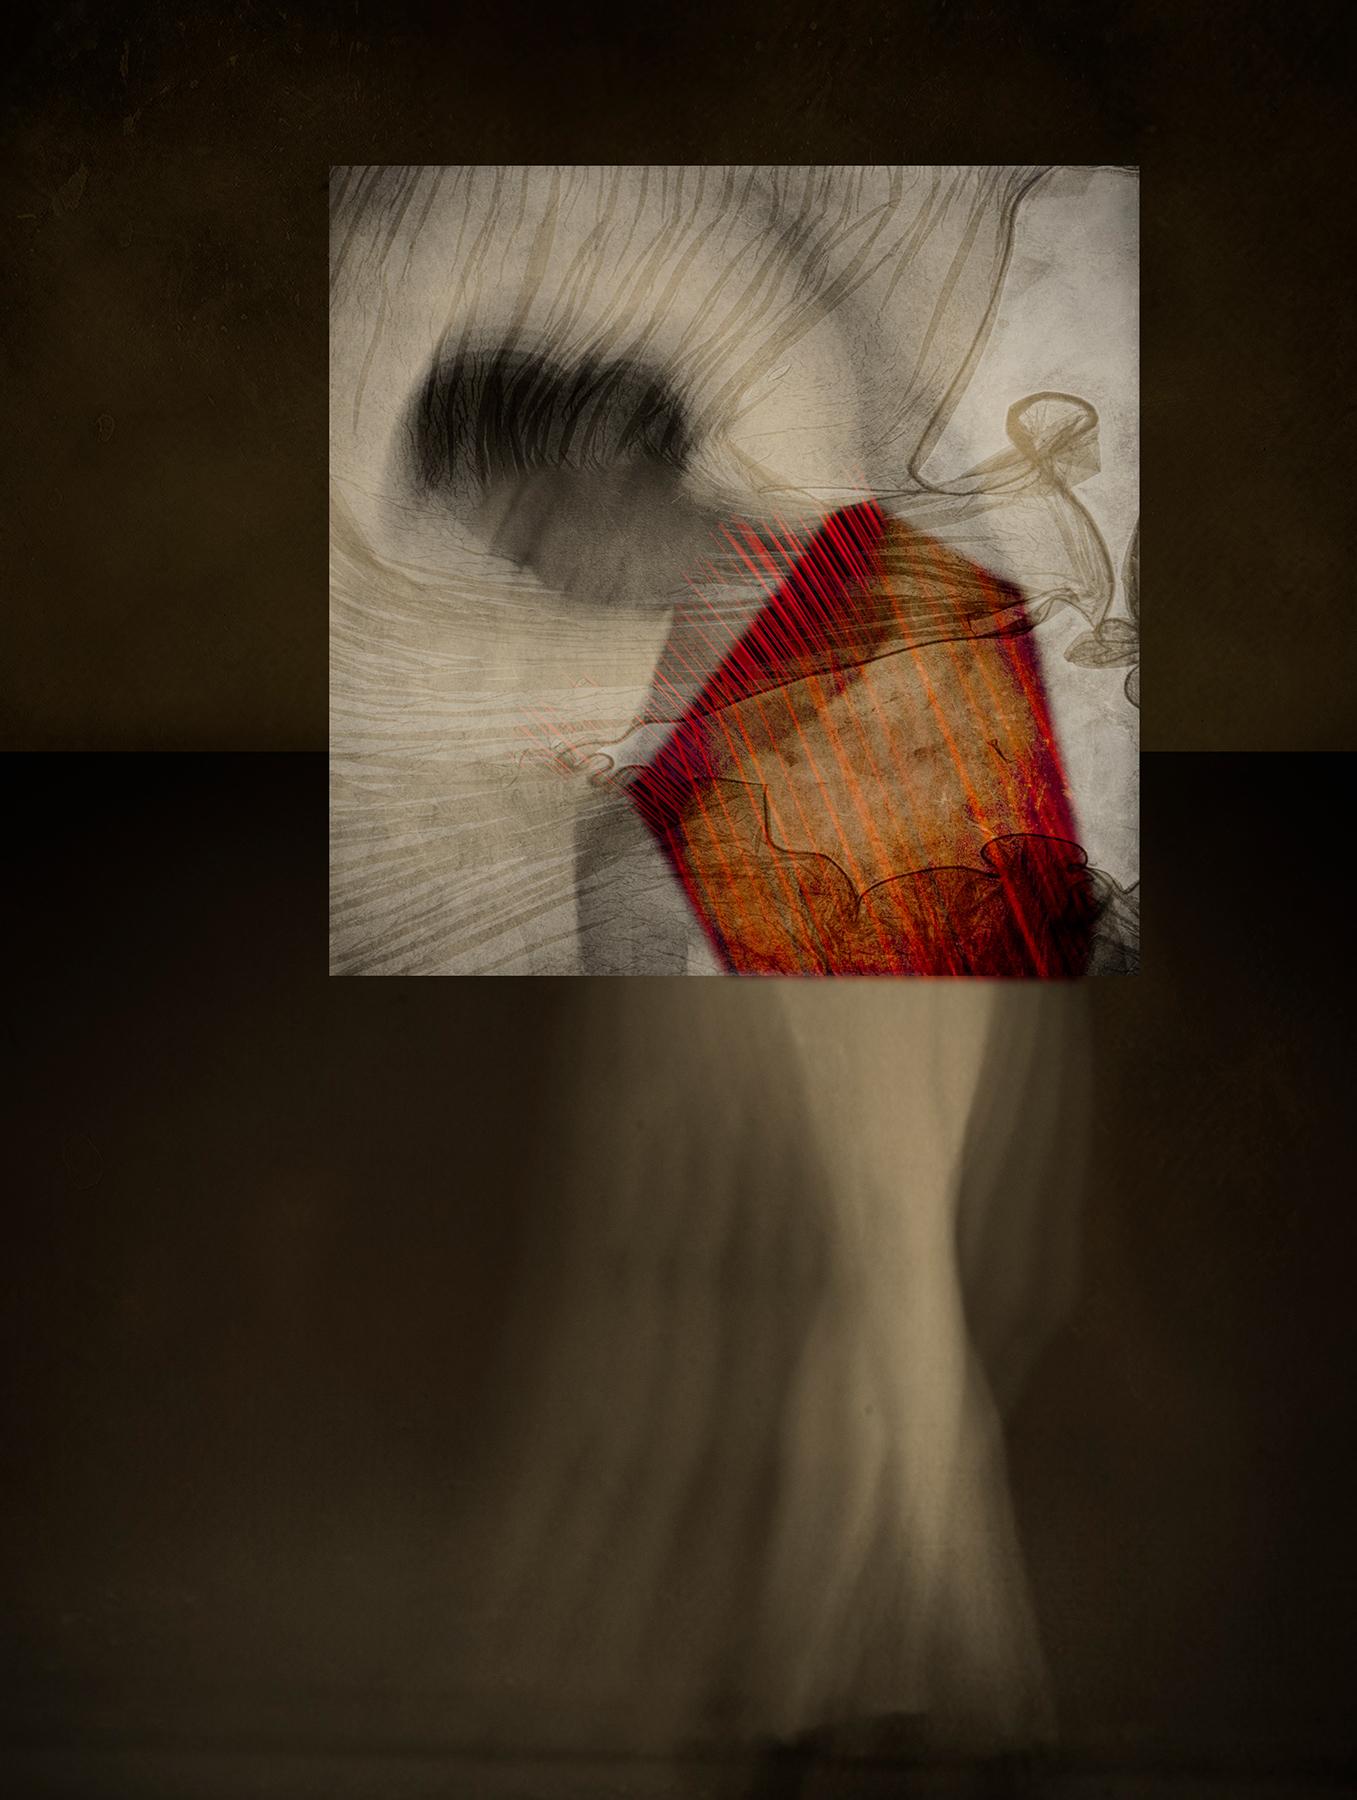 Eduardo_Fujii_Uncertain-Nature-of-Reality_Uncertainty-Principle_01.jpg